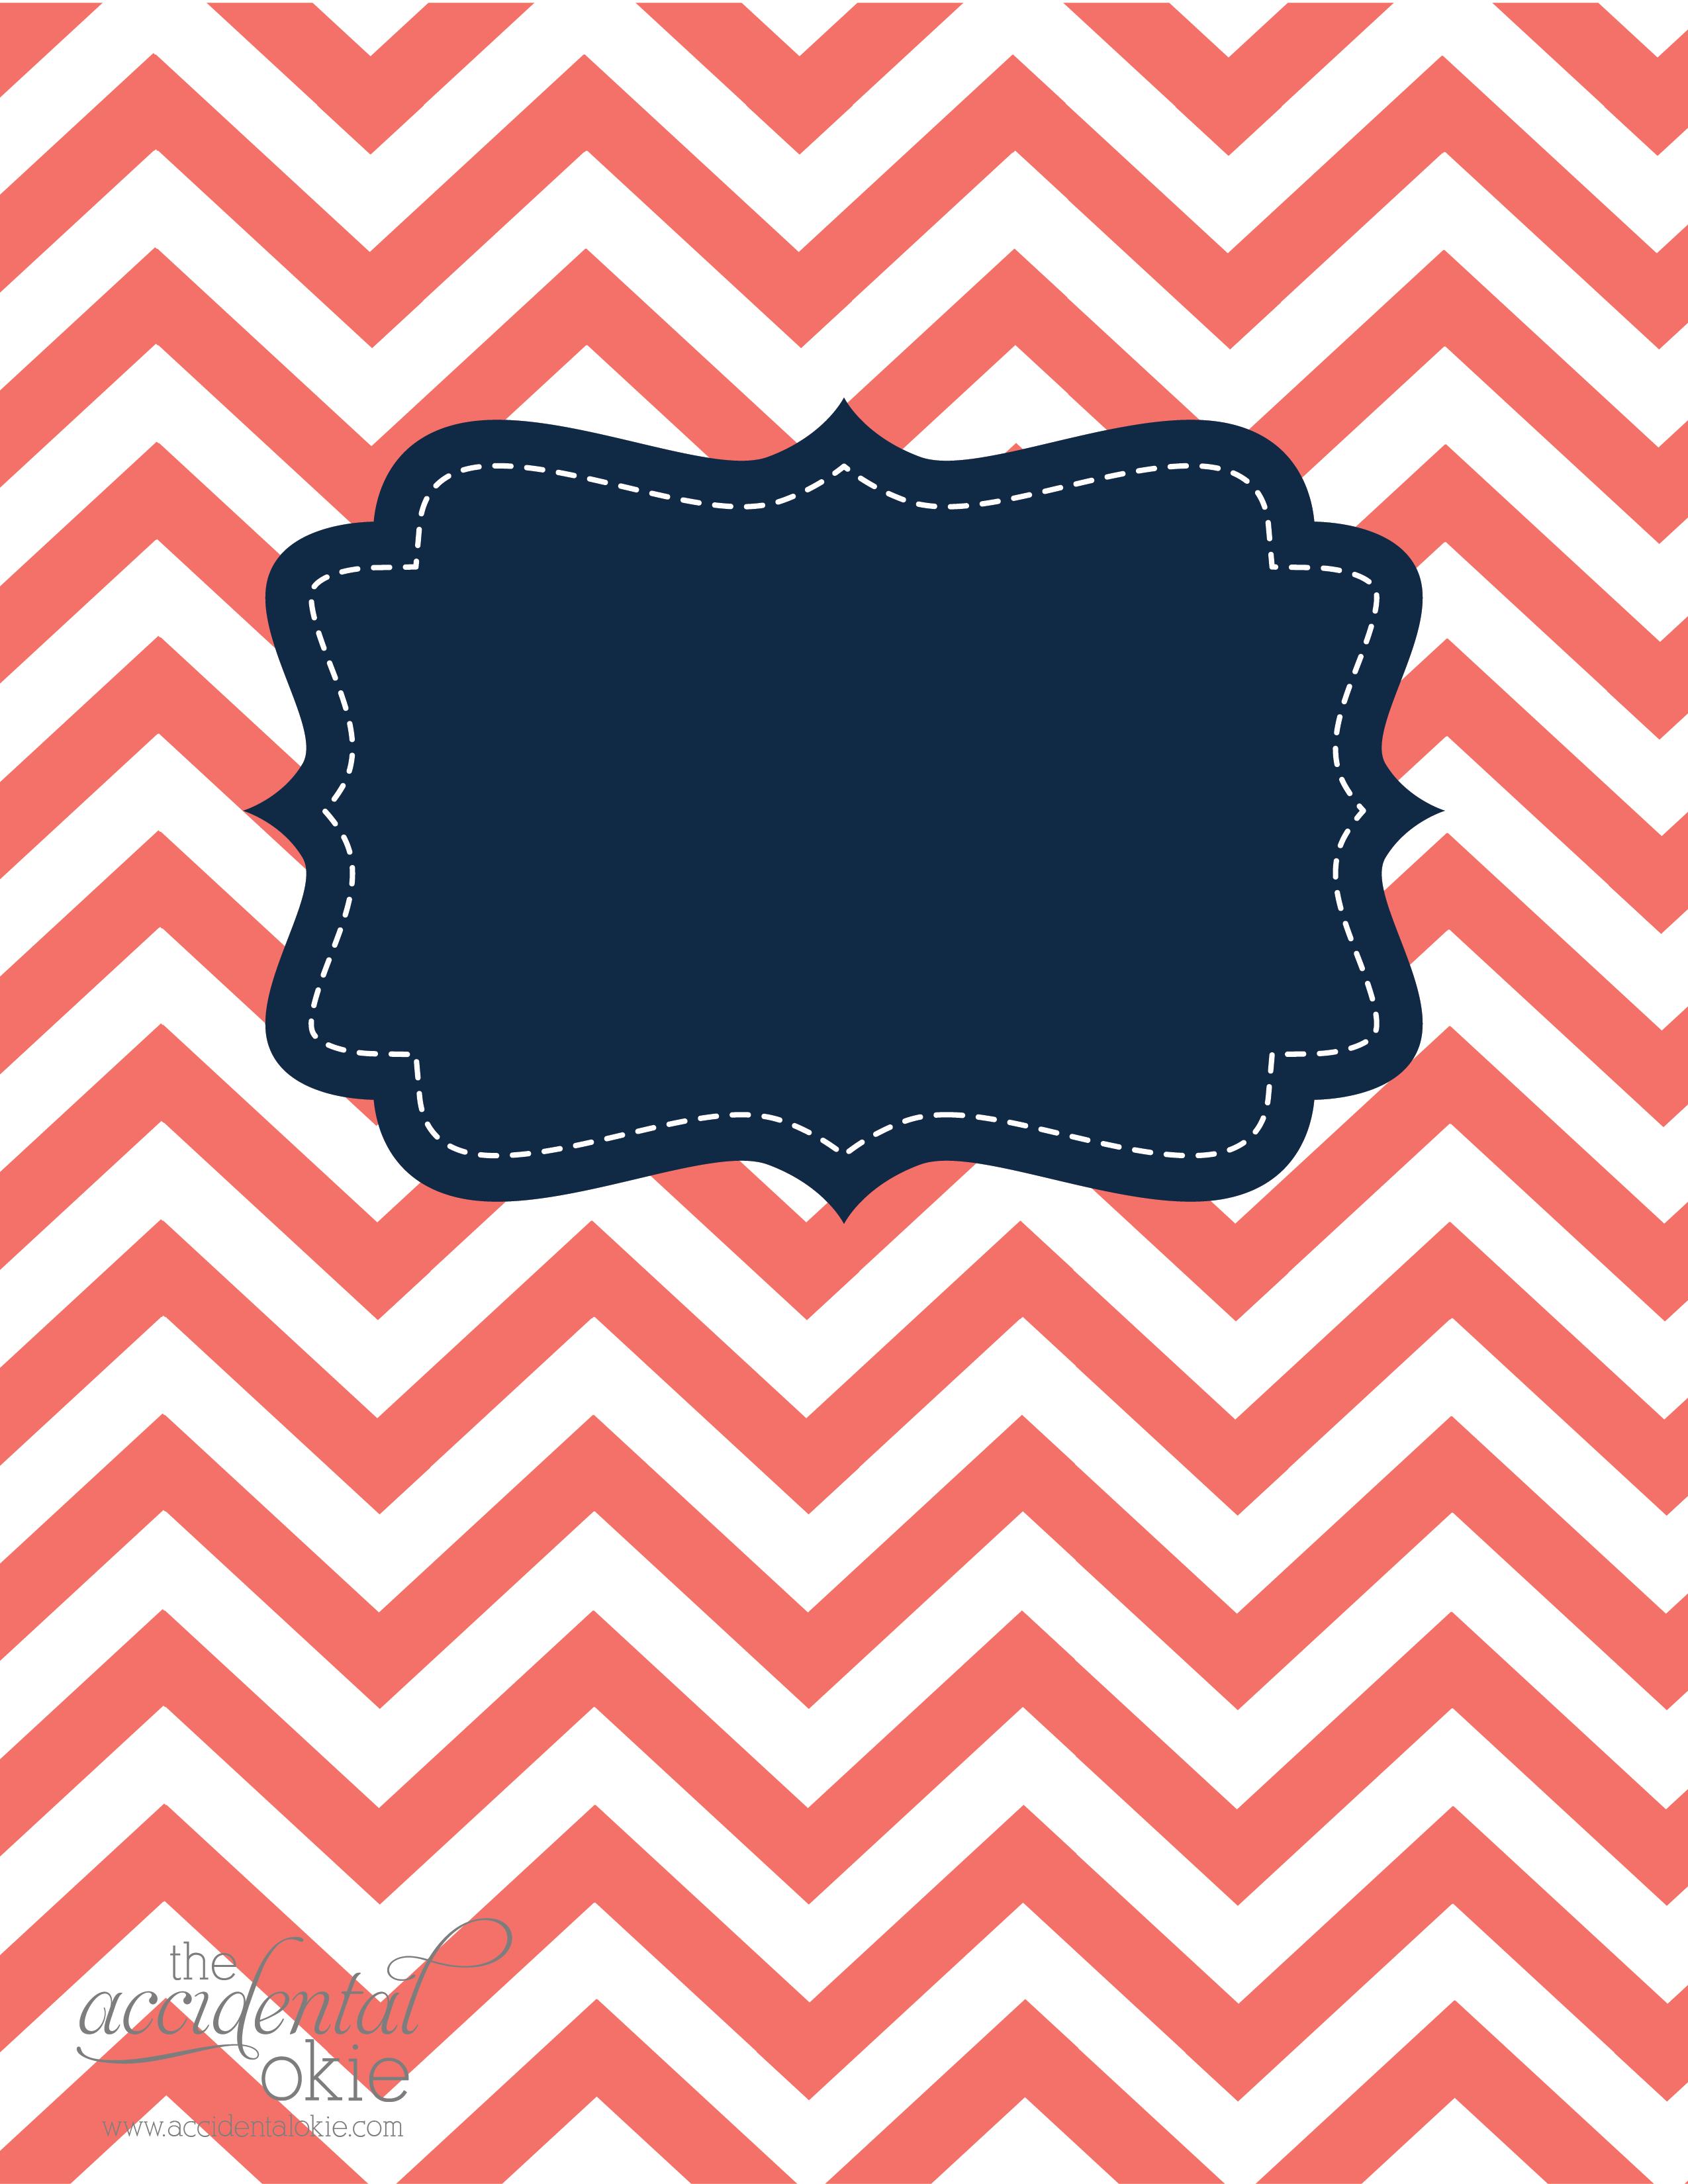 Printable Binder Covers Design Template